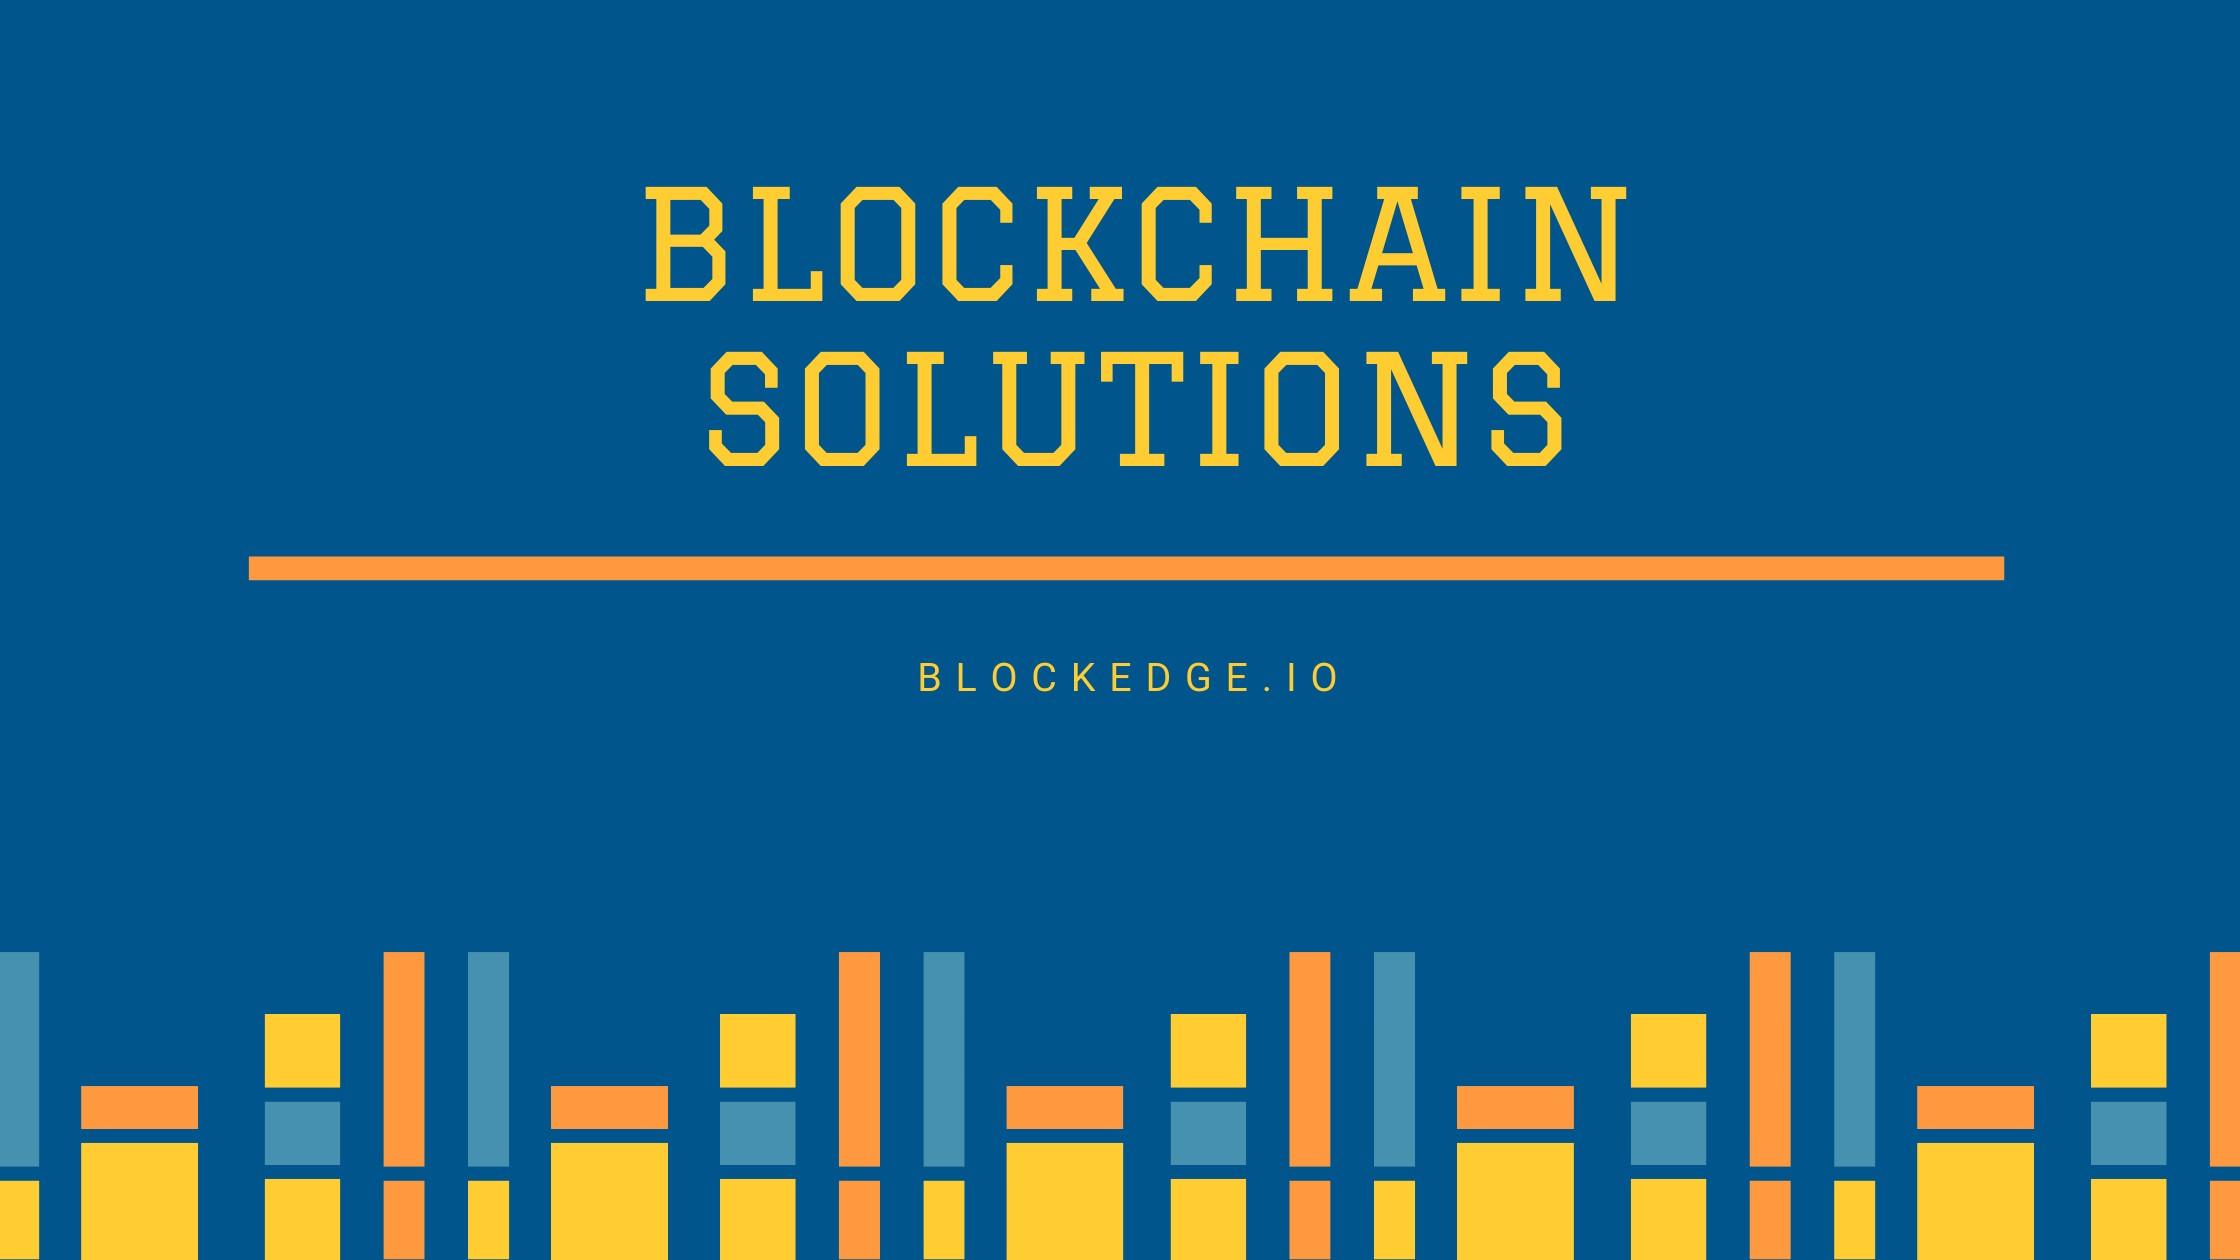 Blockchain solutions company